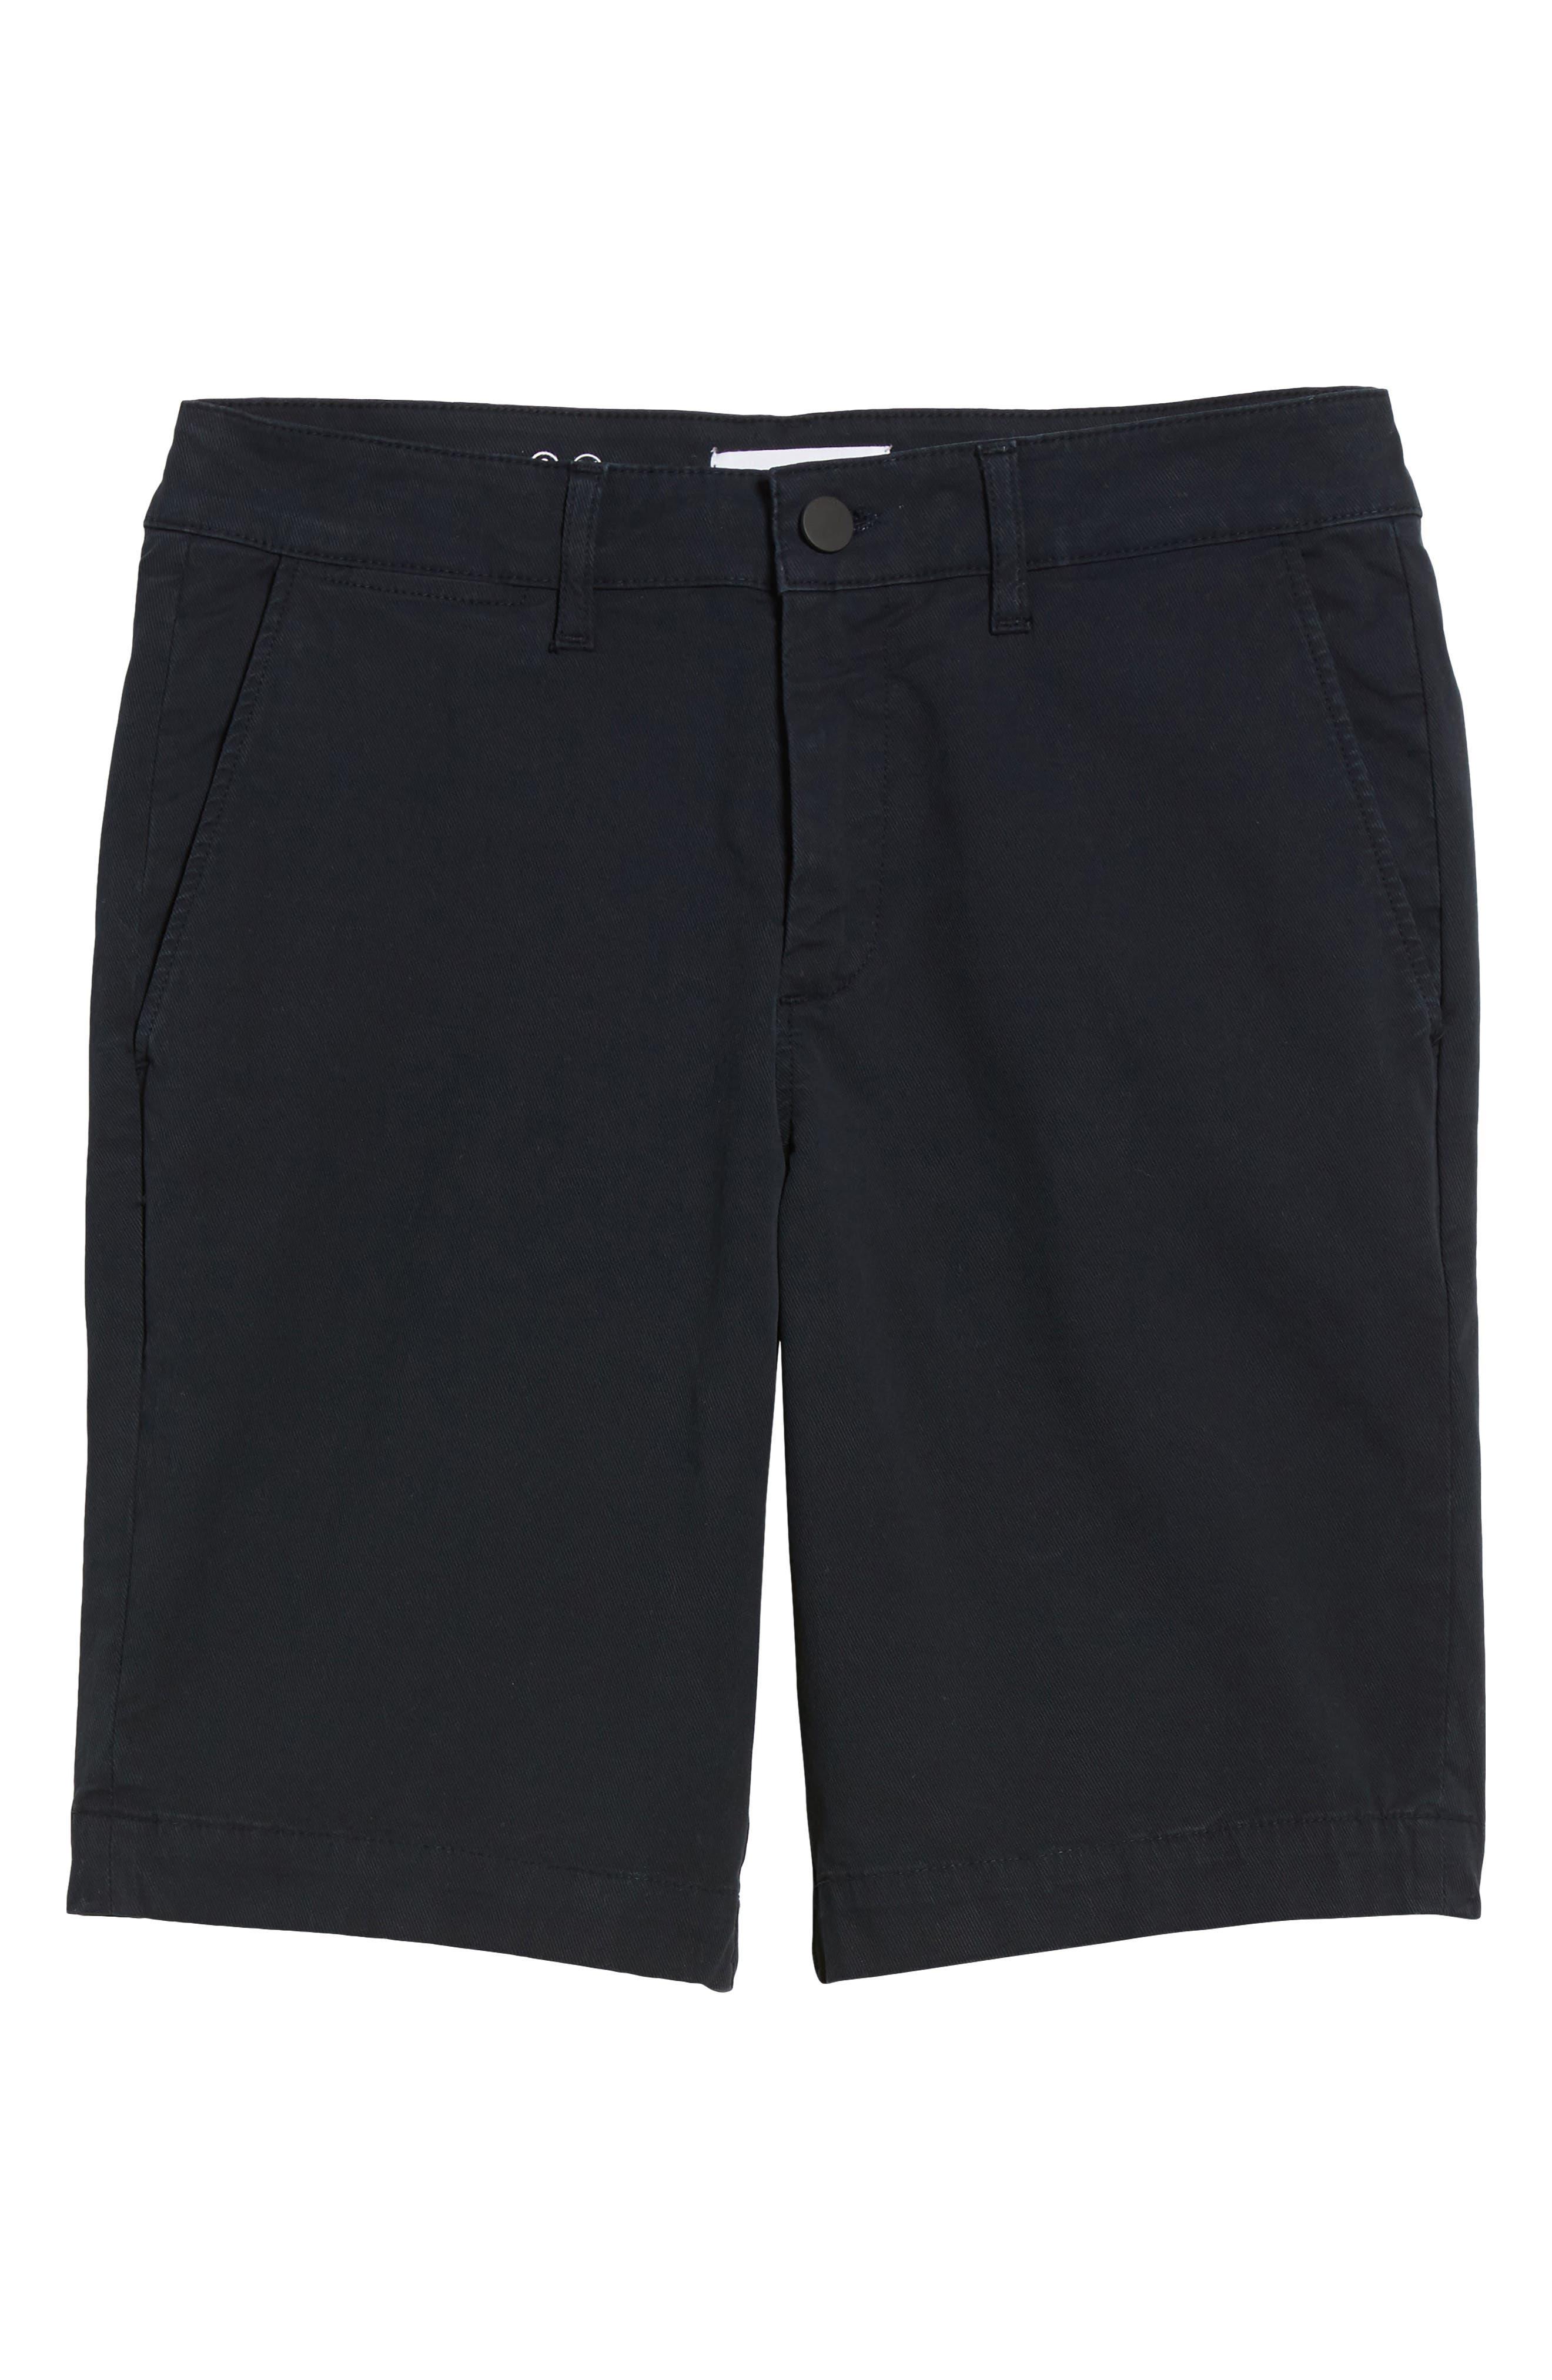 Jake Slim Fit Chino Shorts,                             Alternate thumbnail 6, color,                             Shroud